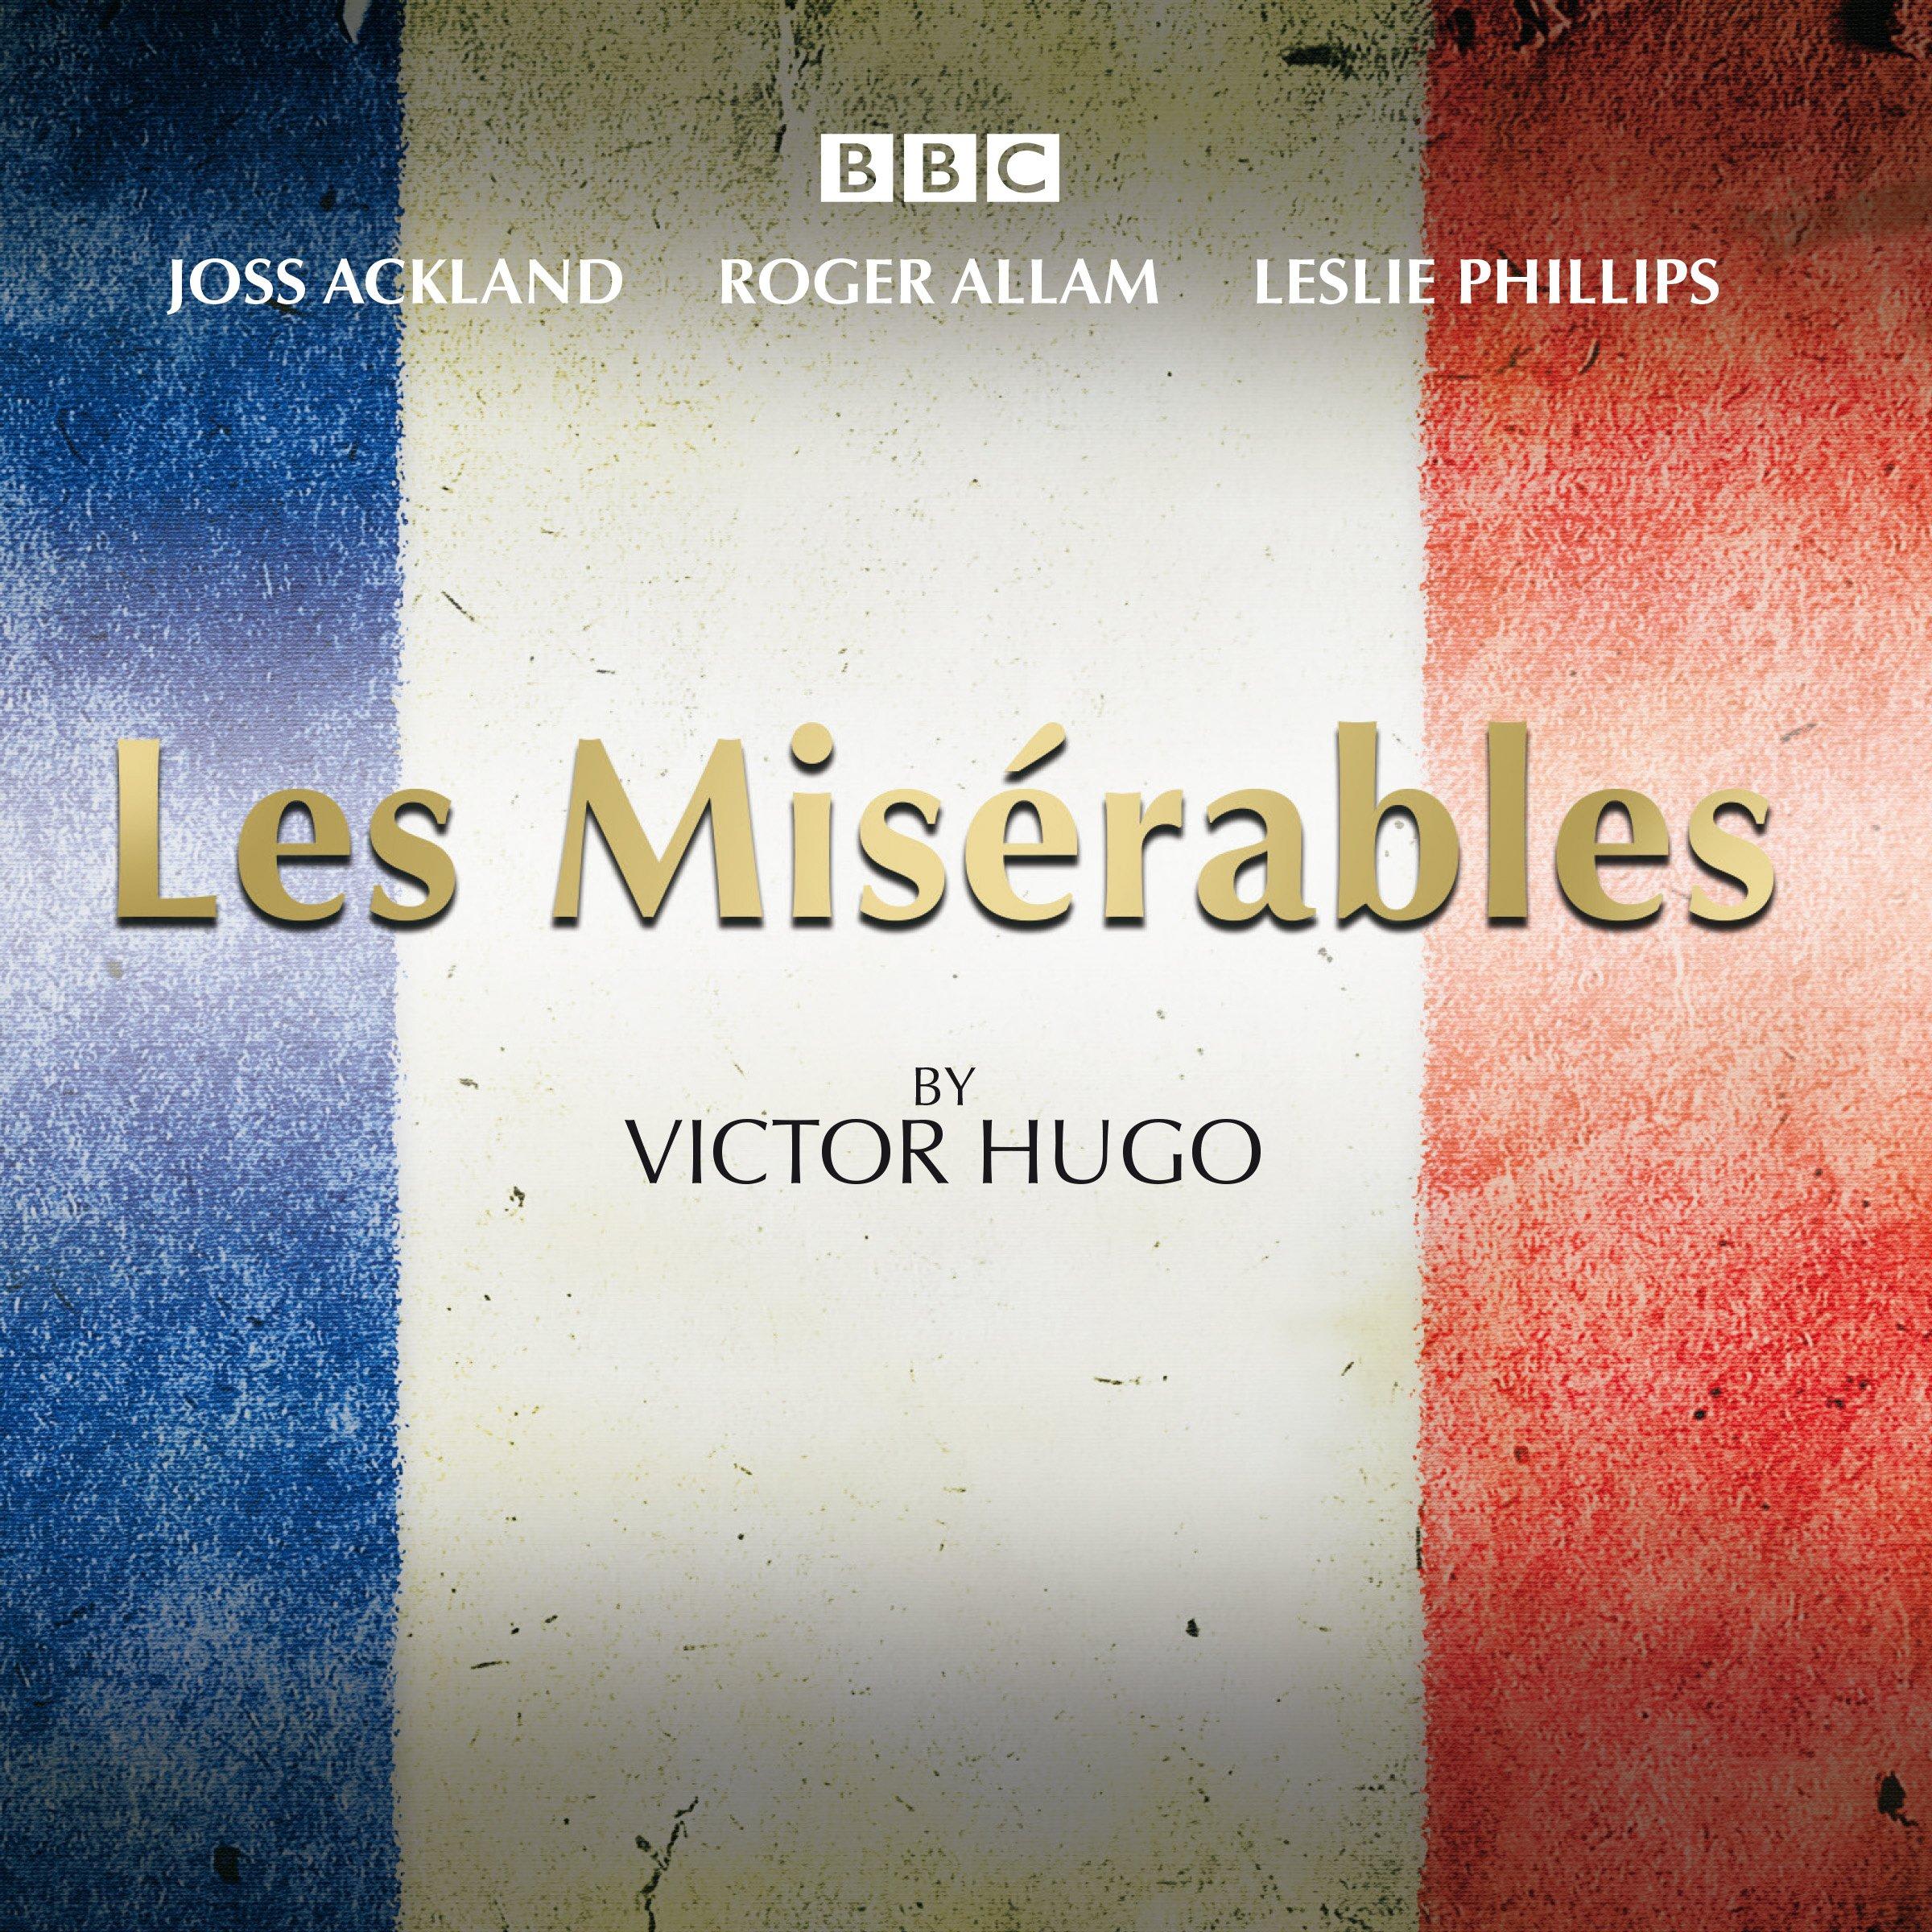 Les Miserables: A BBC Radio 4 Full-Cast Dramatisation: Victor Hugo, Full  Cast, Joss Ackland, Roger Allam: 9781785290374: Amazon.com: Books